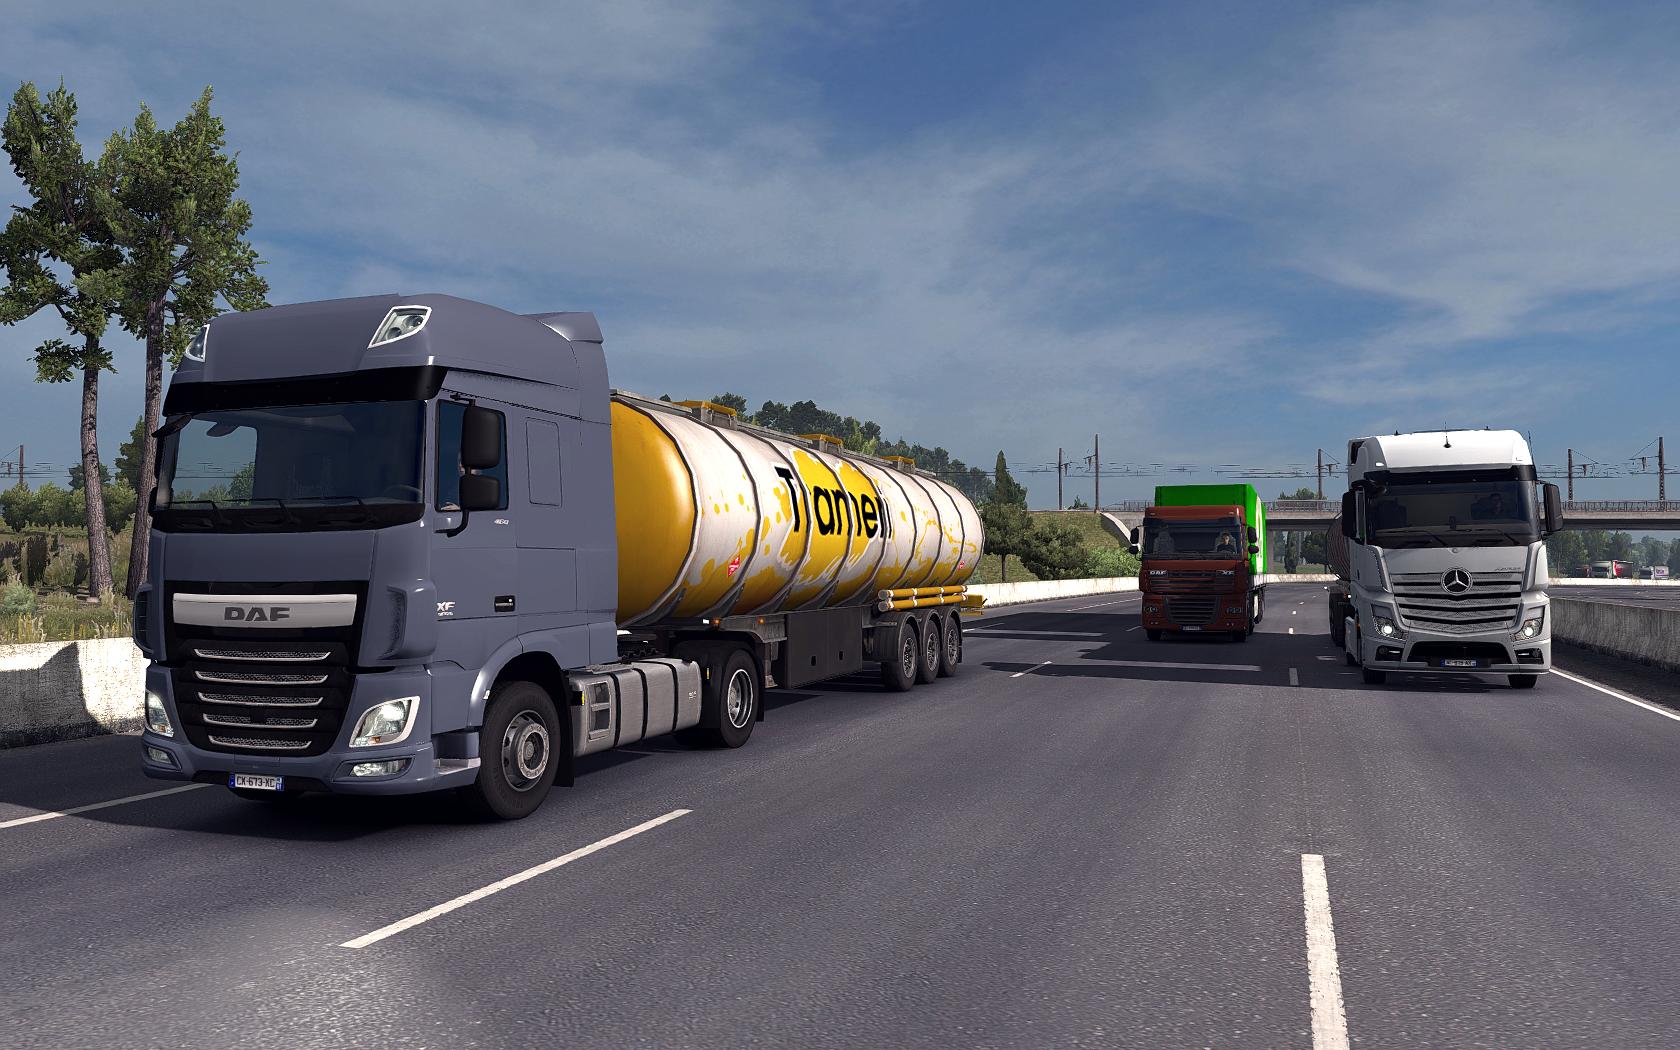 eurotrucks2 2017-05-21 17-37-05.png - Euro Truck Simulator 2 Vive la France!